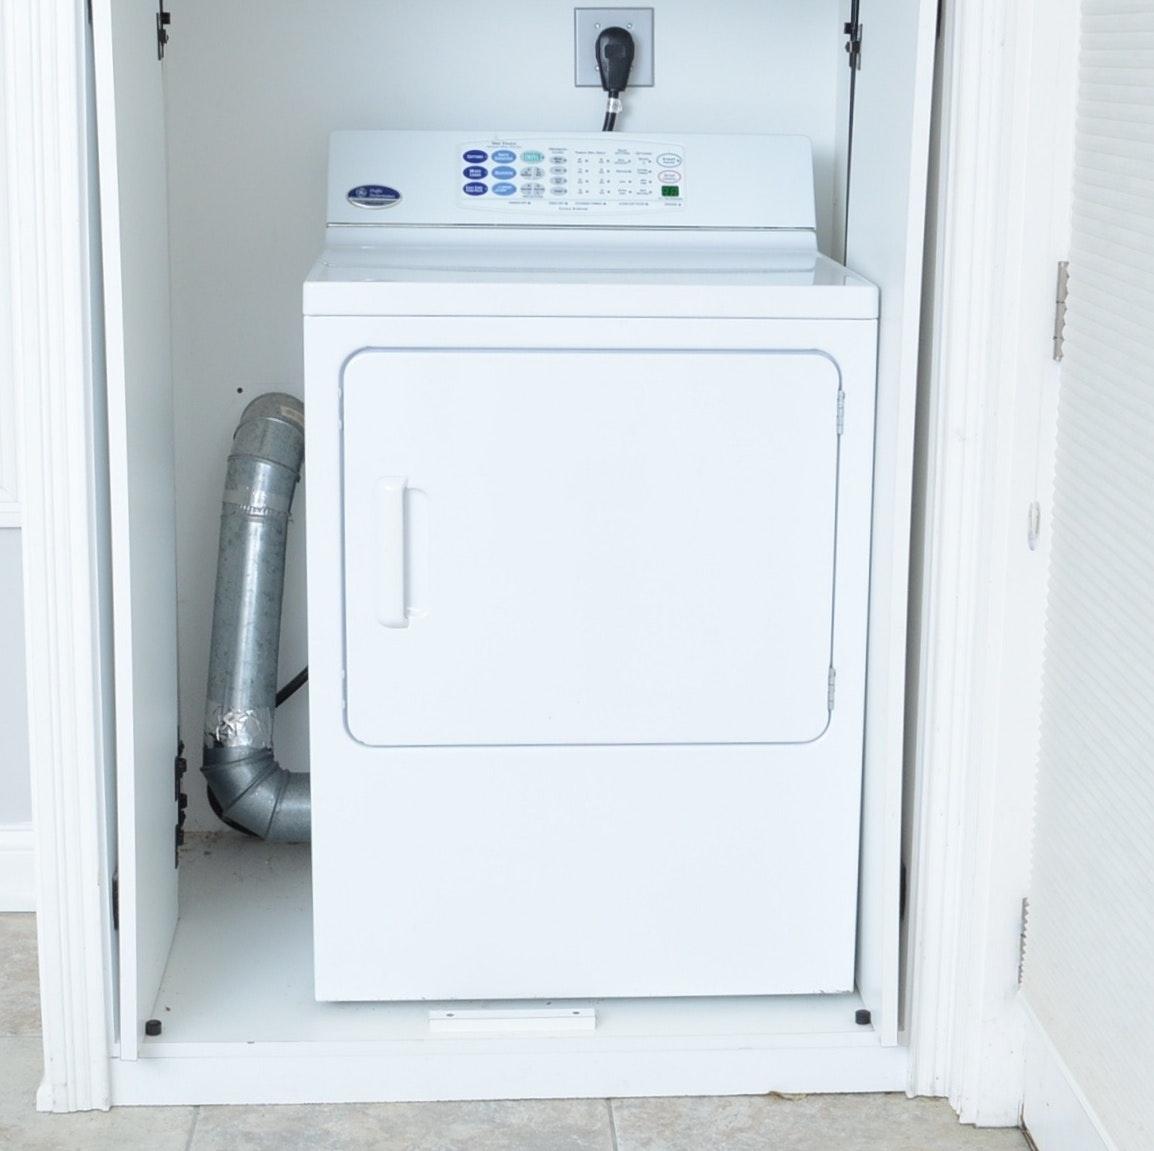 GE Profile Performance Wizard Dryer